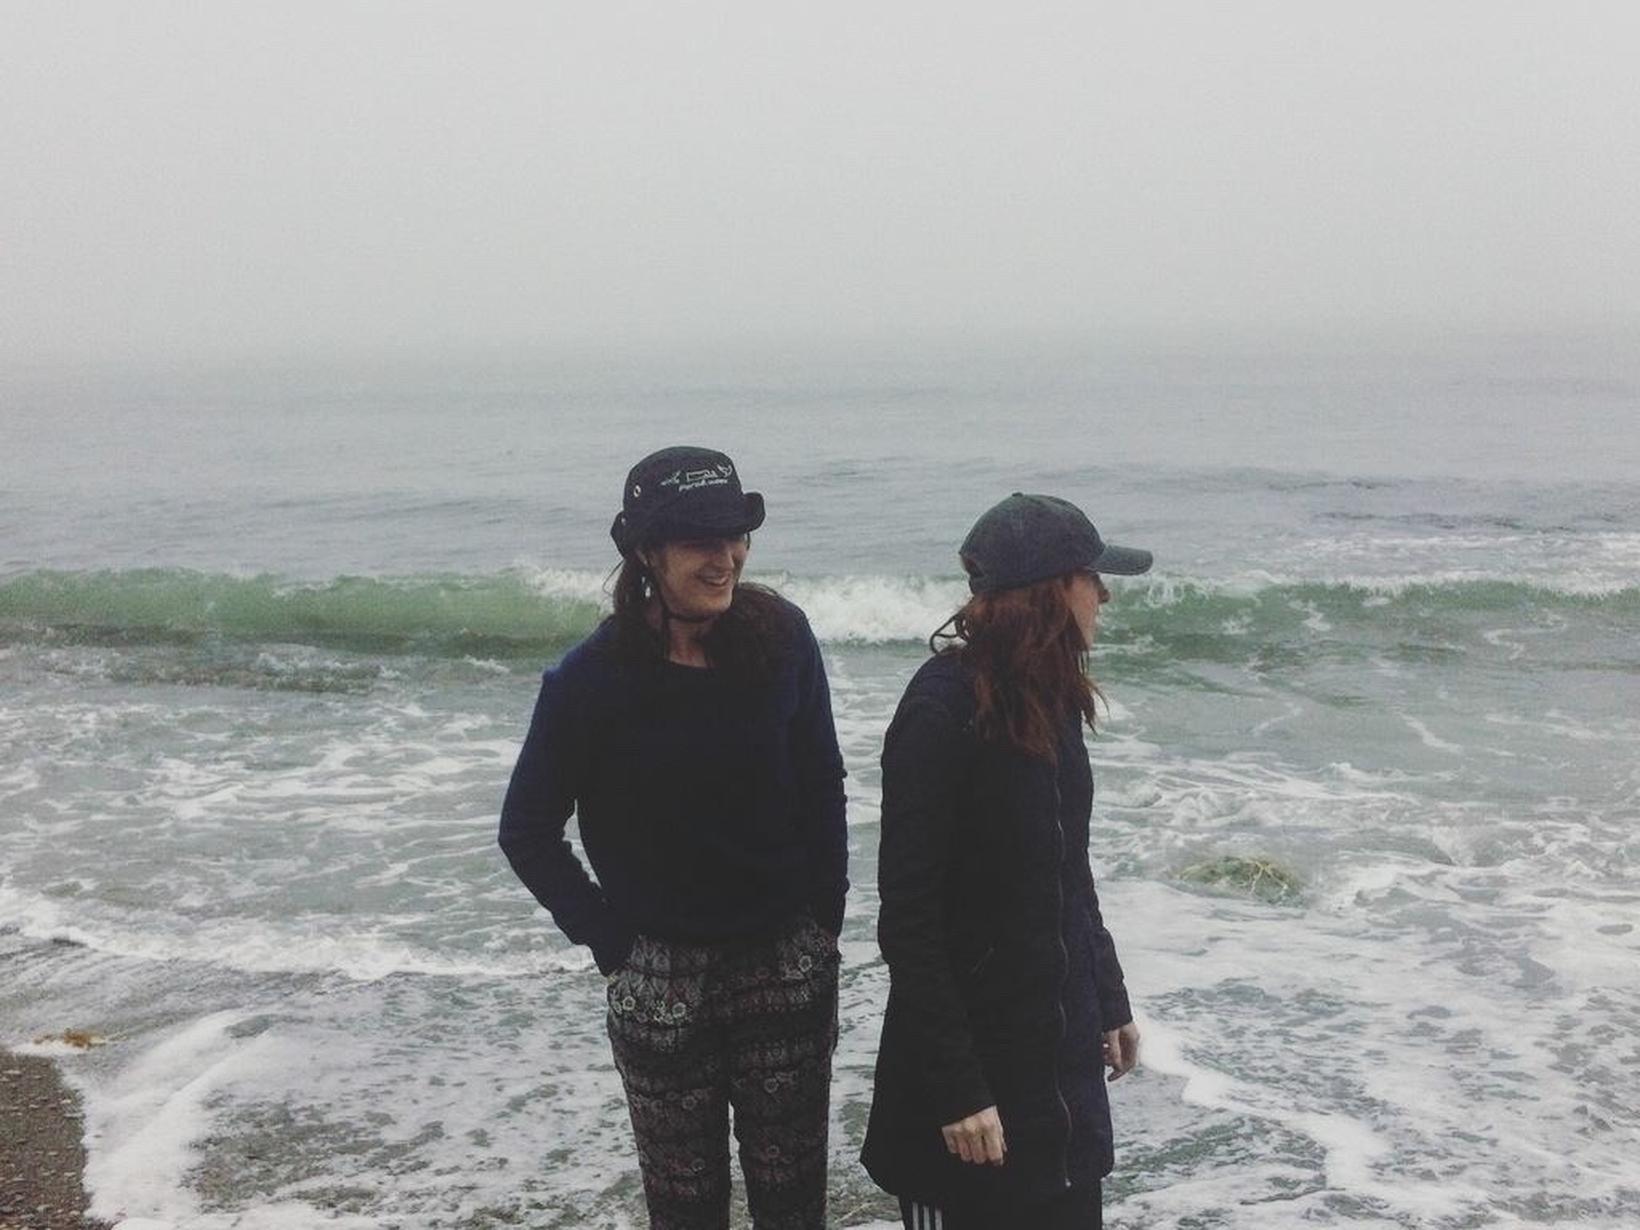 Audrey & Lidia from Québec, Quebec, Canada